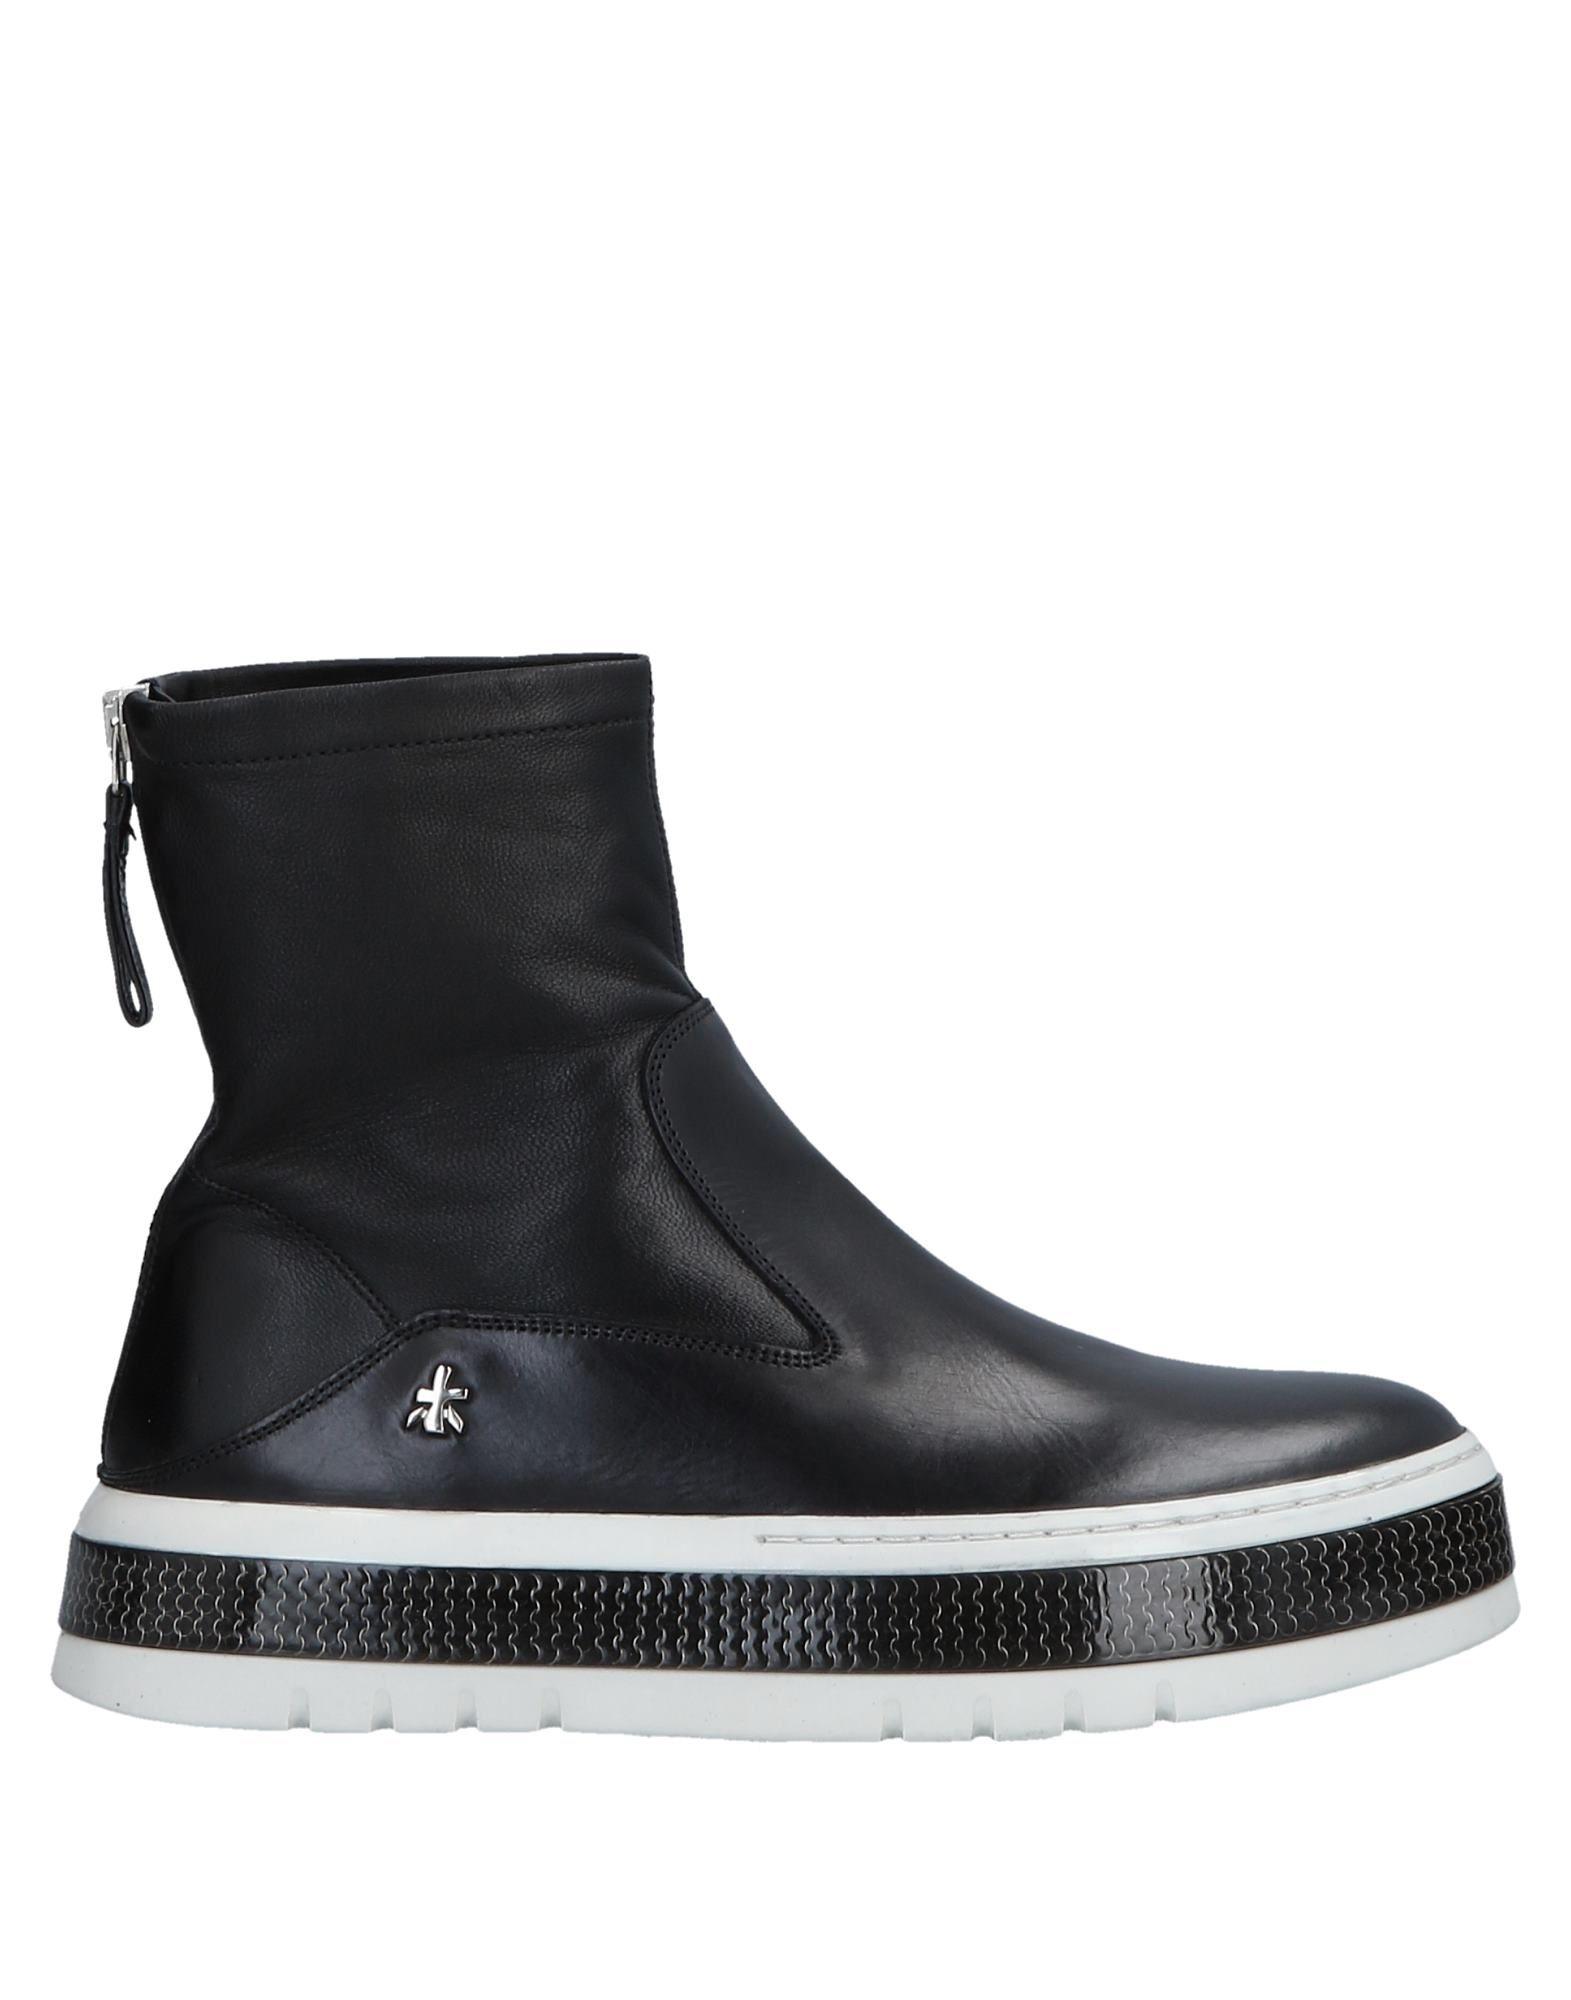 Rabatt Schuhe Premiata Stiefelette  Damen  Stiefelette 11531031QM a502d7